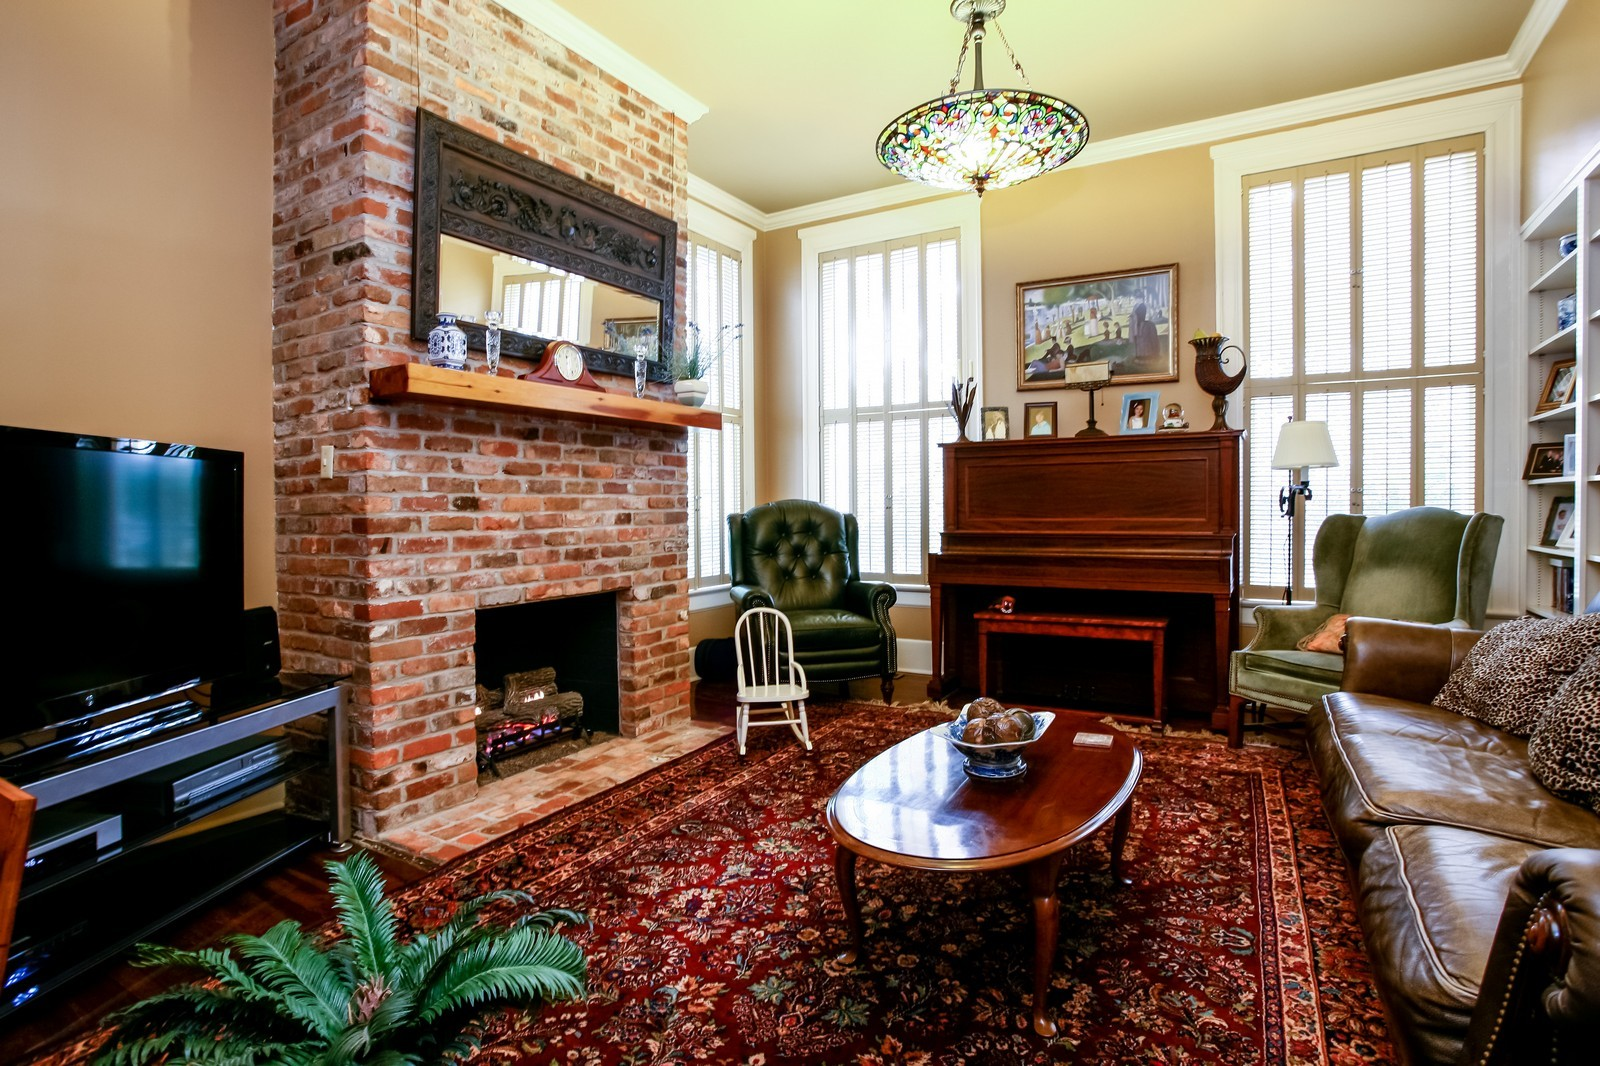 Real Estate Photography - 414 N 14th St, Lanett, AL, 36863 - Family Room